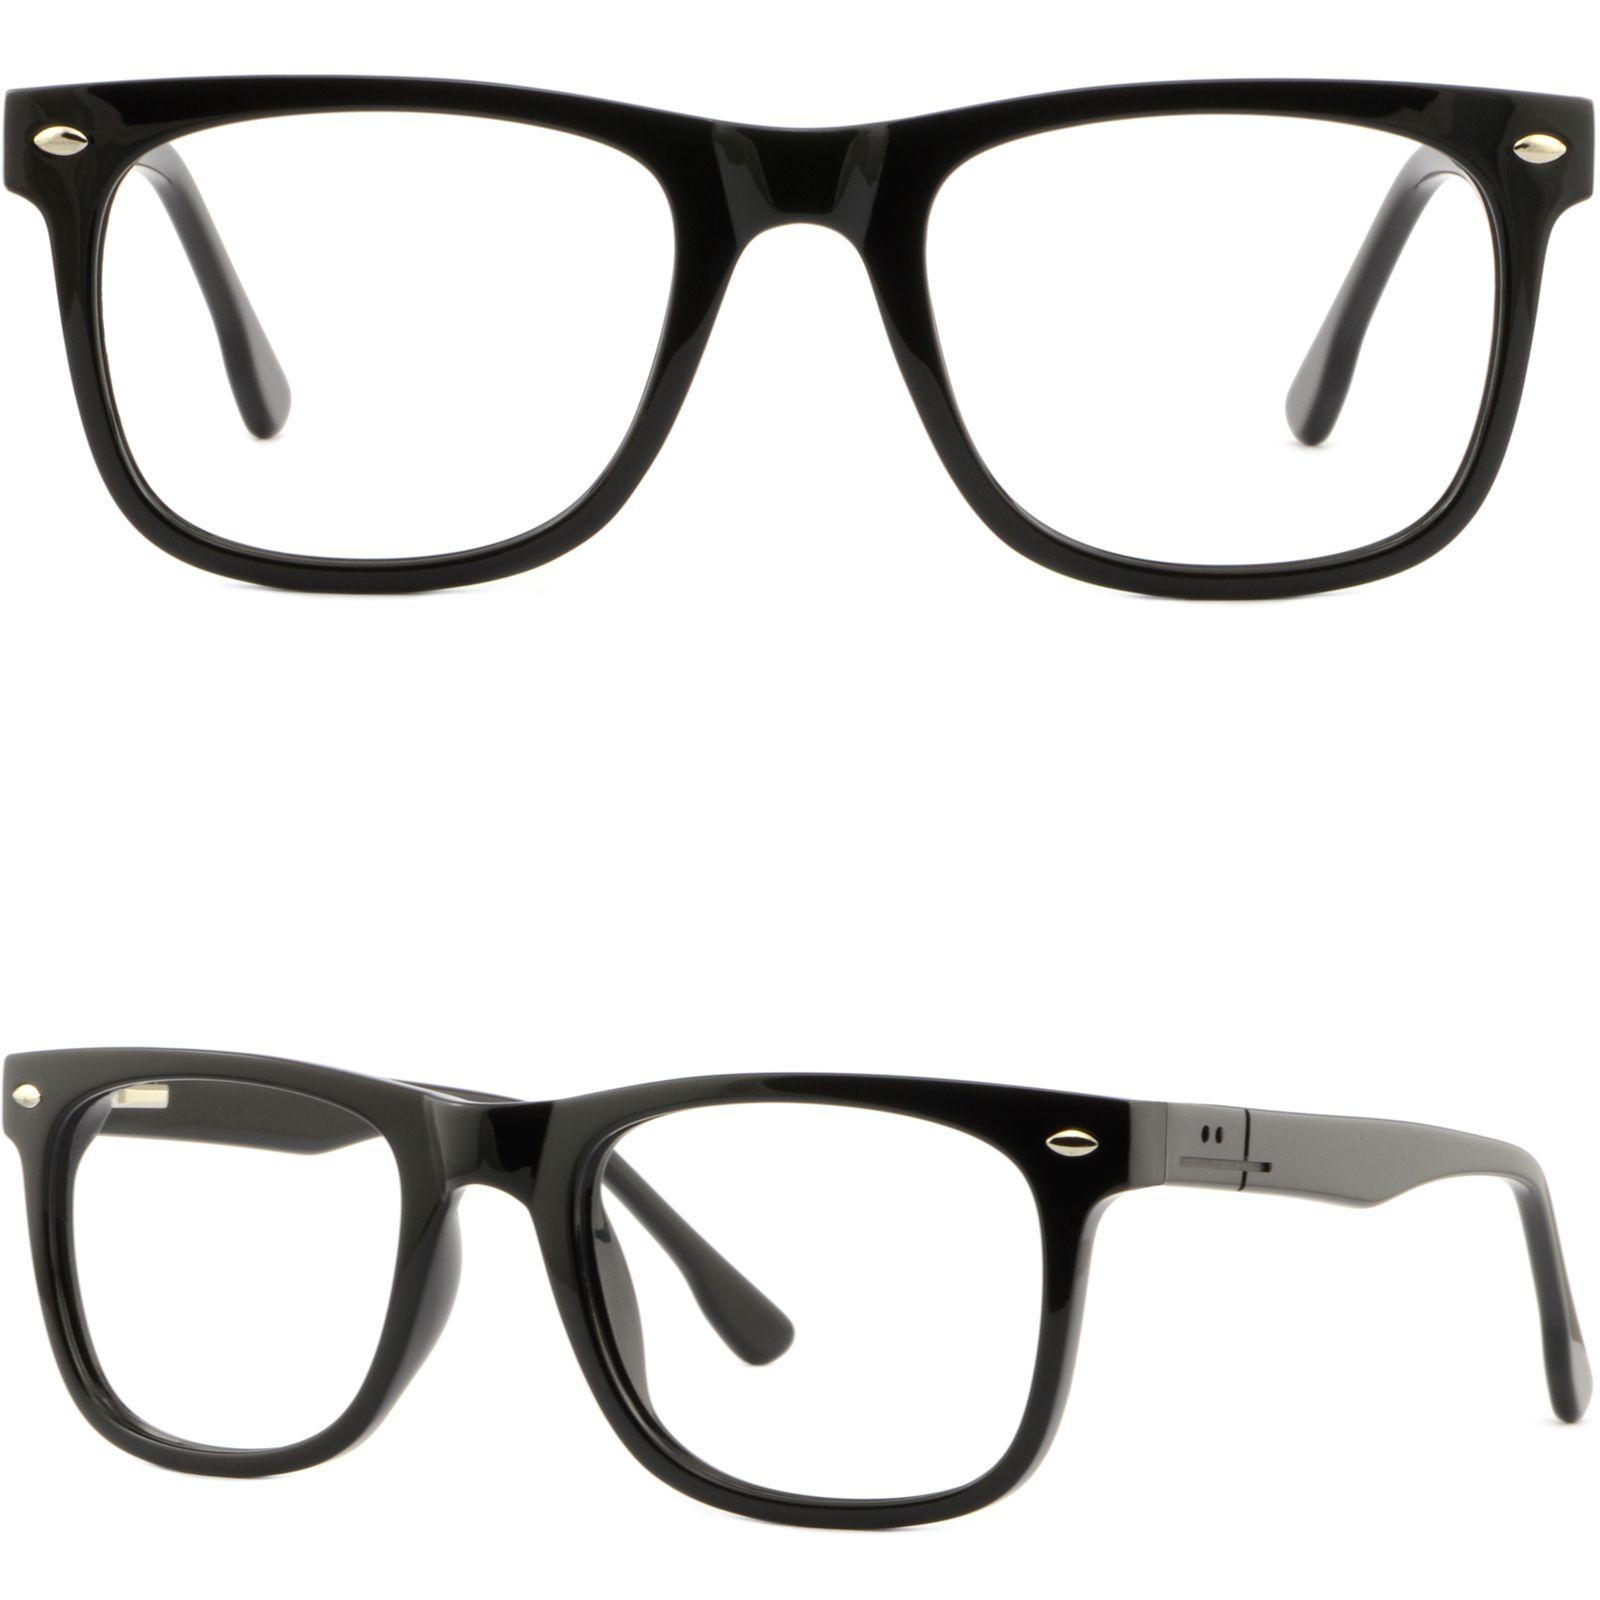 e6f05d814b Men Women Plastic Acetate Frame Prescription Glasses Eyeglasses Shiny Dots  Black Brille Fassung Gestel Glasses Frame Online with  23.9 Piece on  Aceglasses s ...